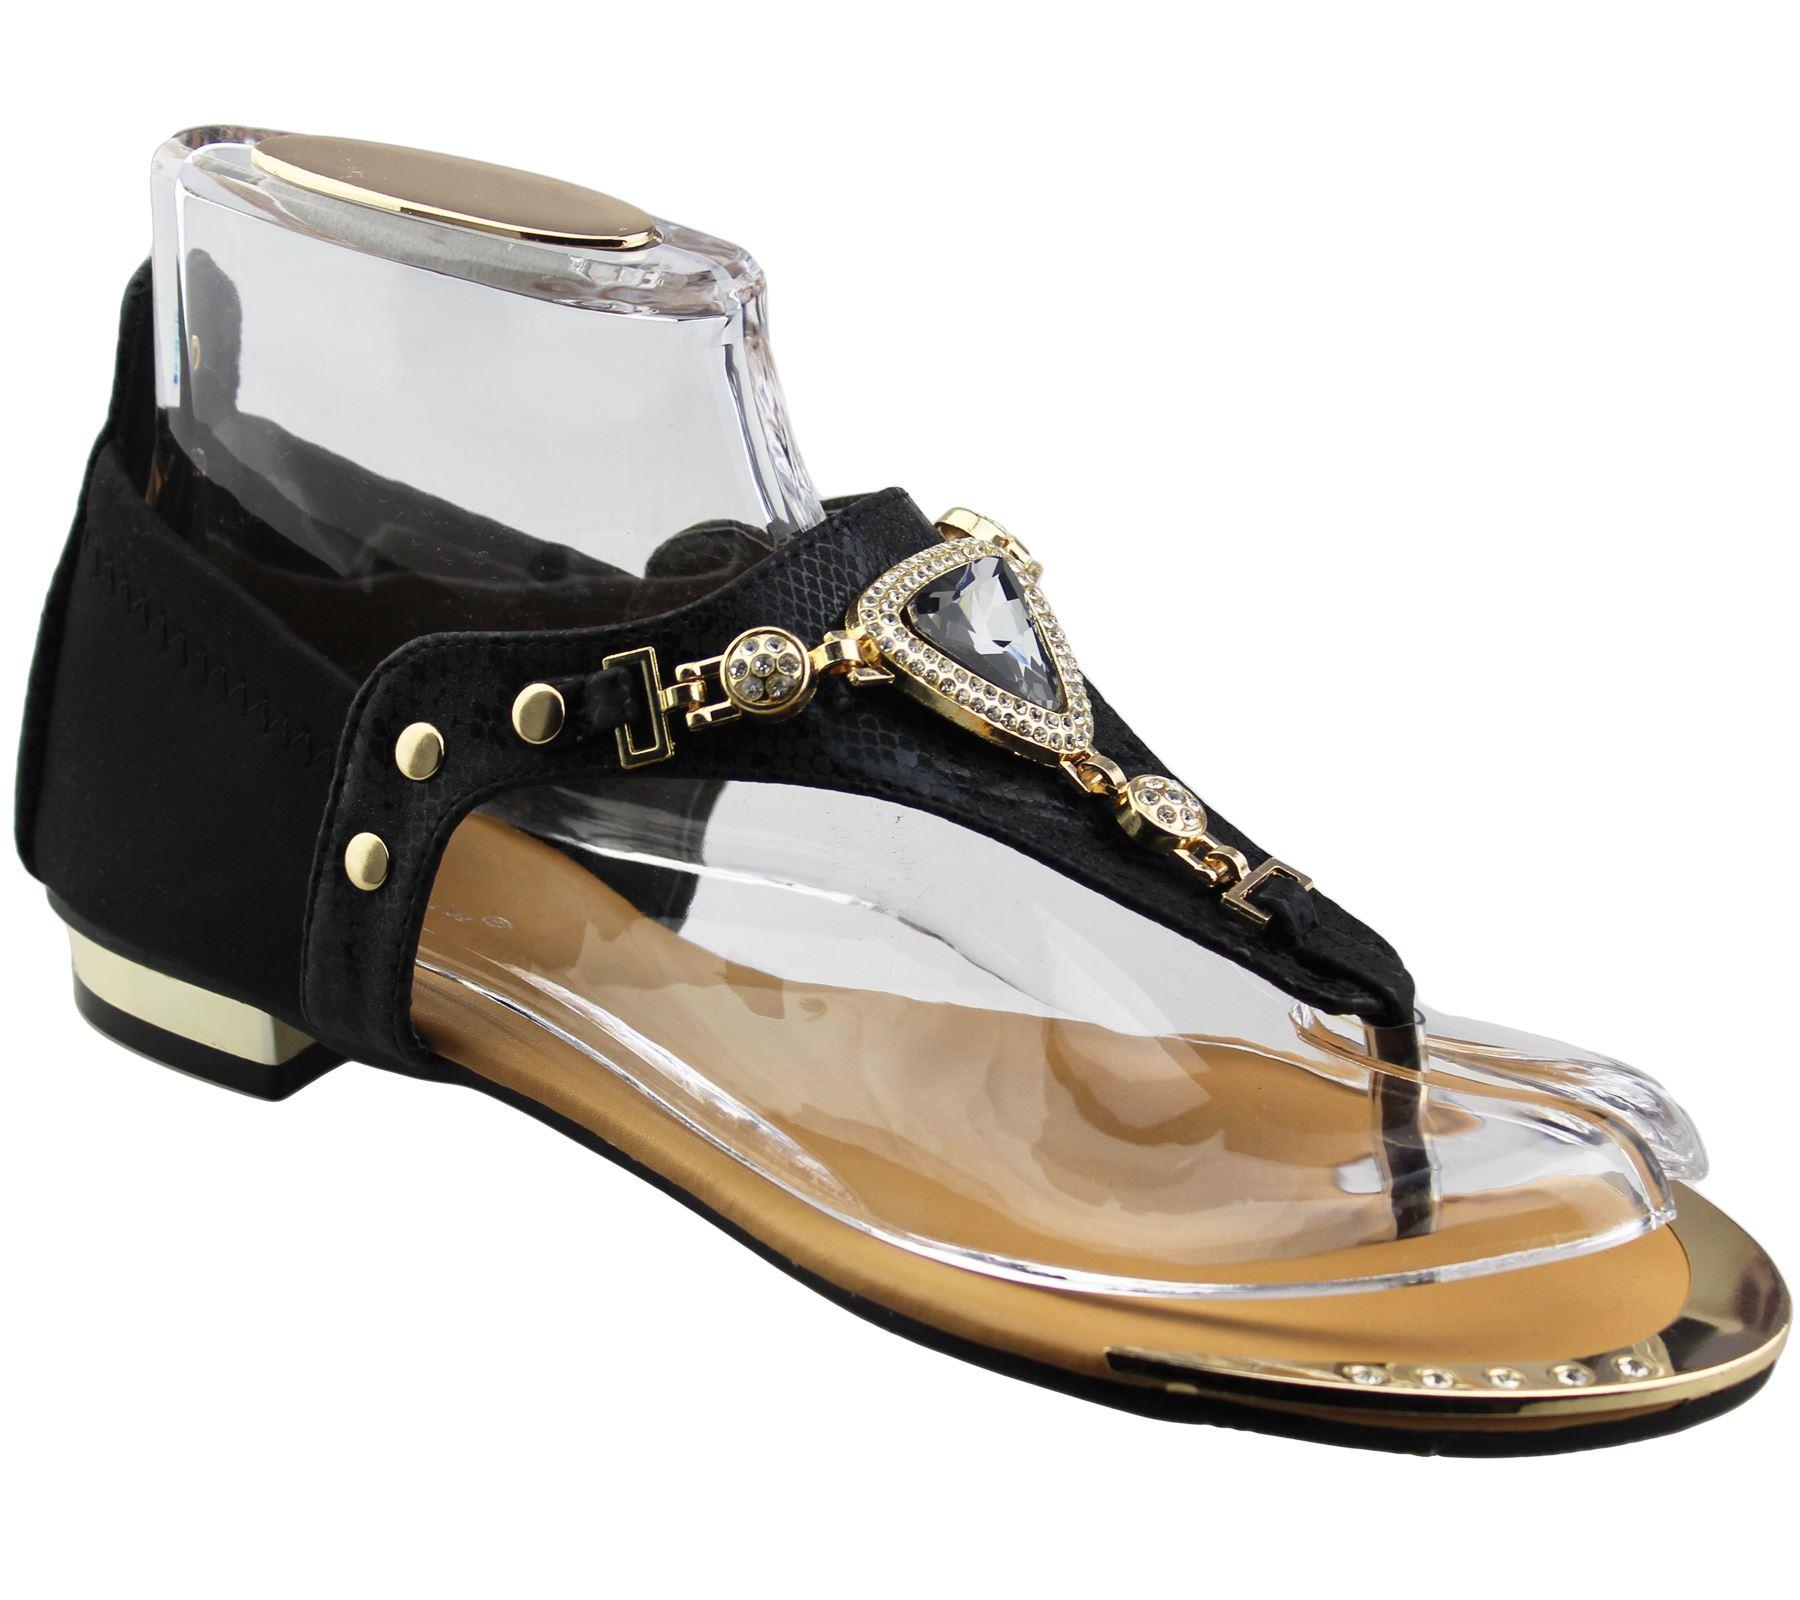 Womens-Flat-Summer-Sandals-Ladies-Diamante-Wedding-Toe-Post-Casual-Slipper thumbnail 7